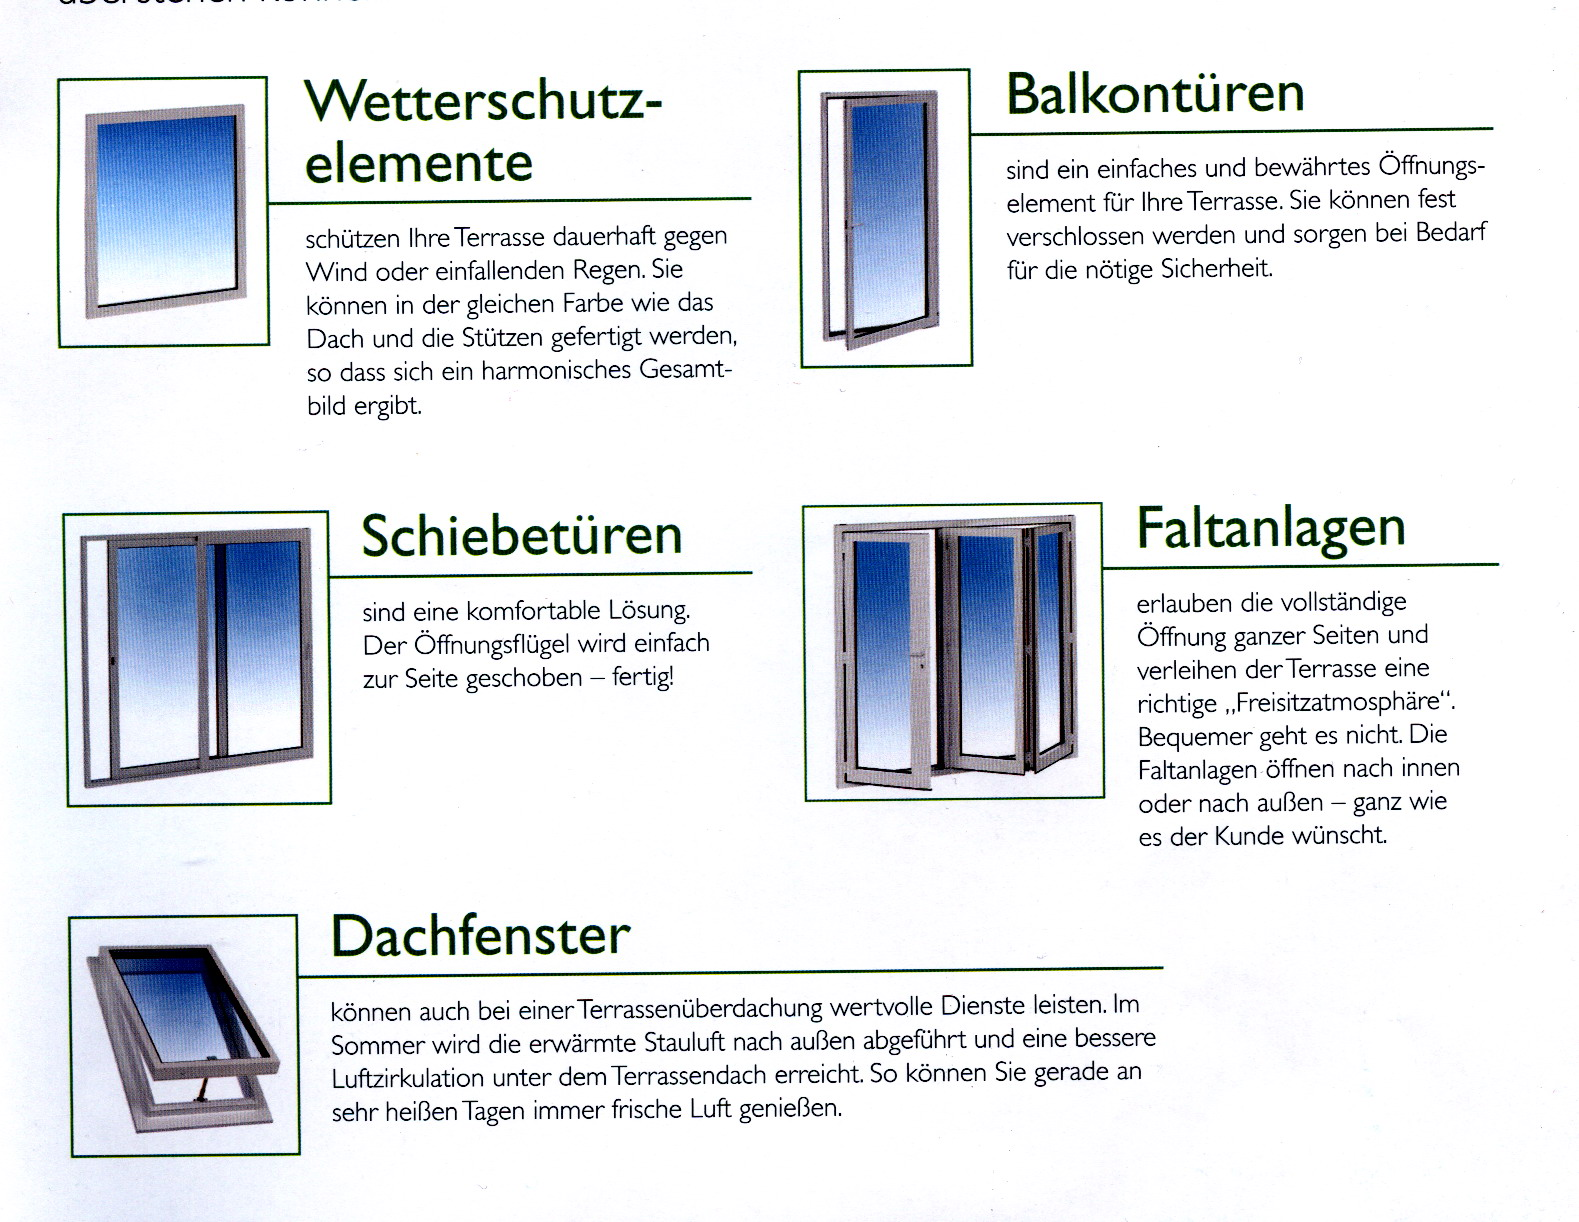 Schiebeturen Fur Die Terrasse ? Bitmoon.info Balkonturen Modelle Terrasse Veranda